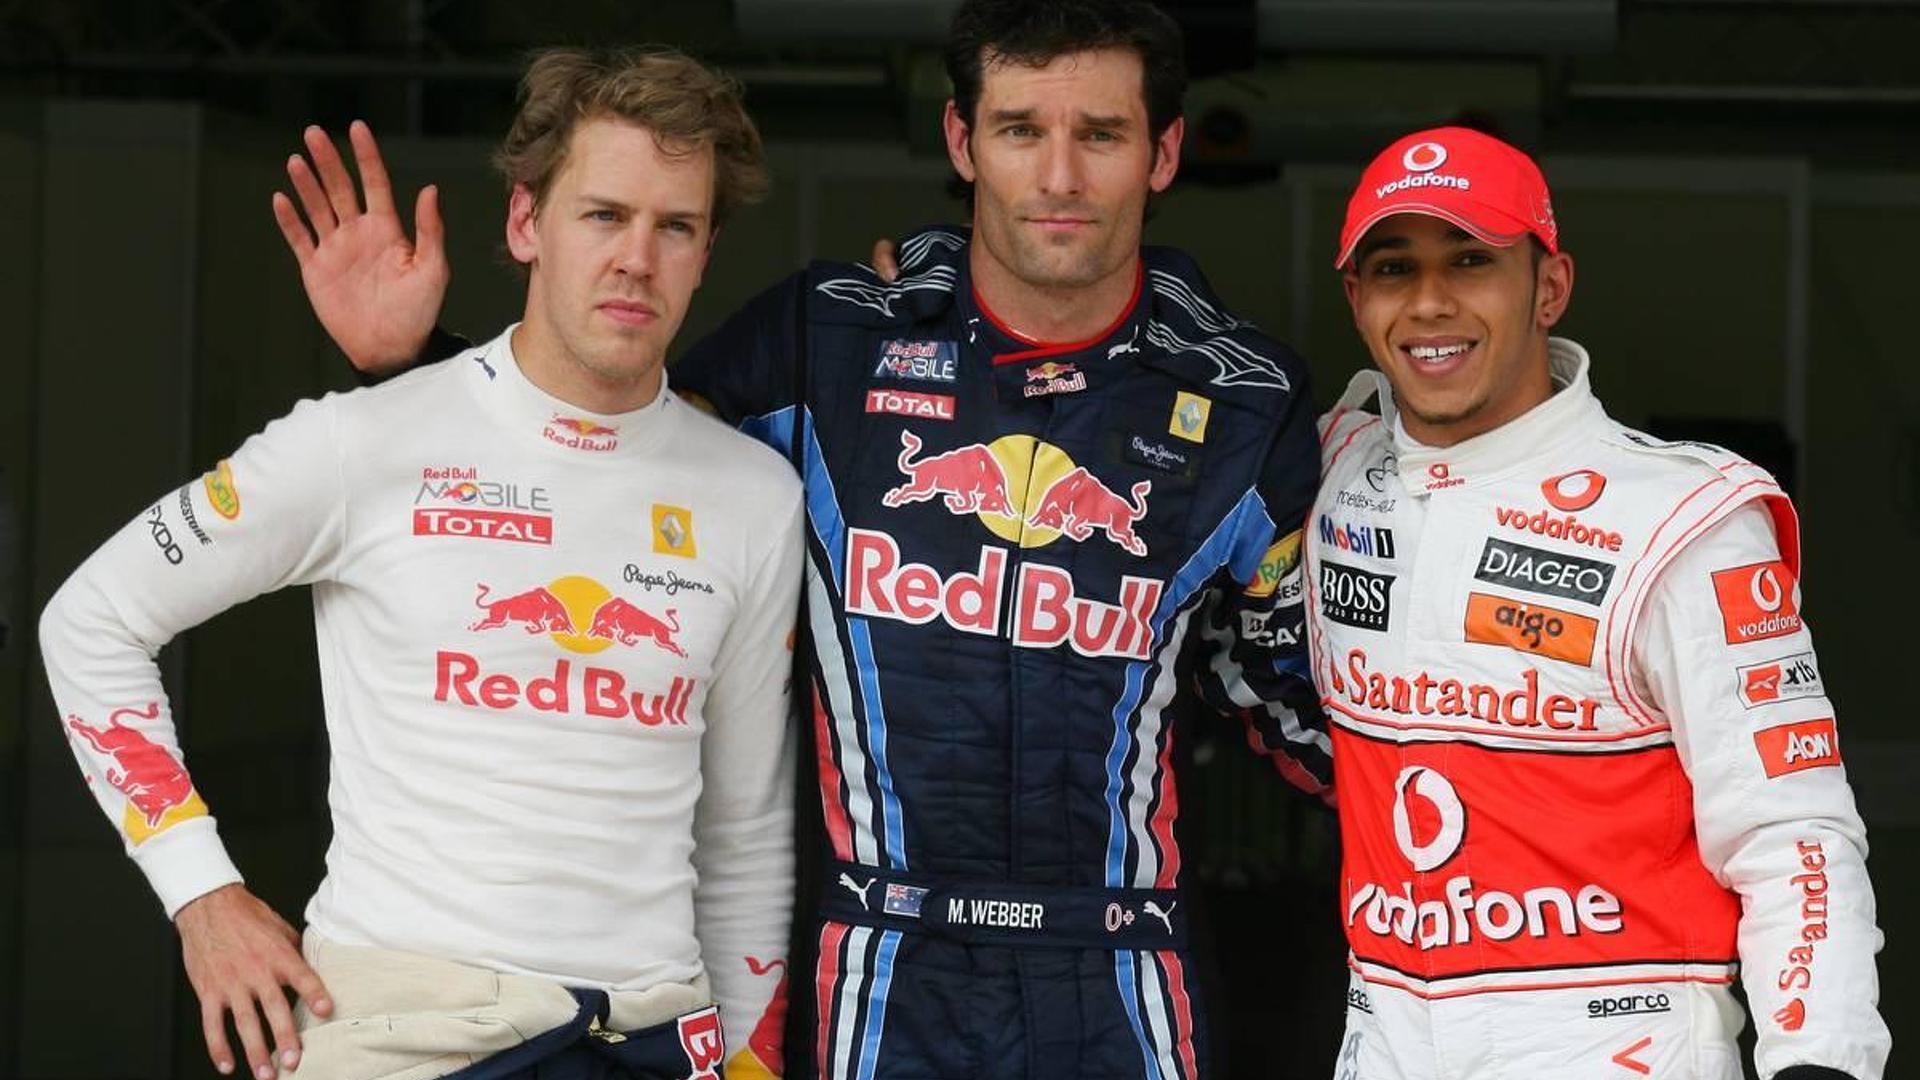 2010 Turkish Grand Prix qualifying - RESULTS